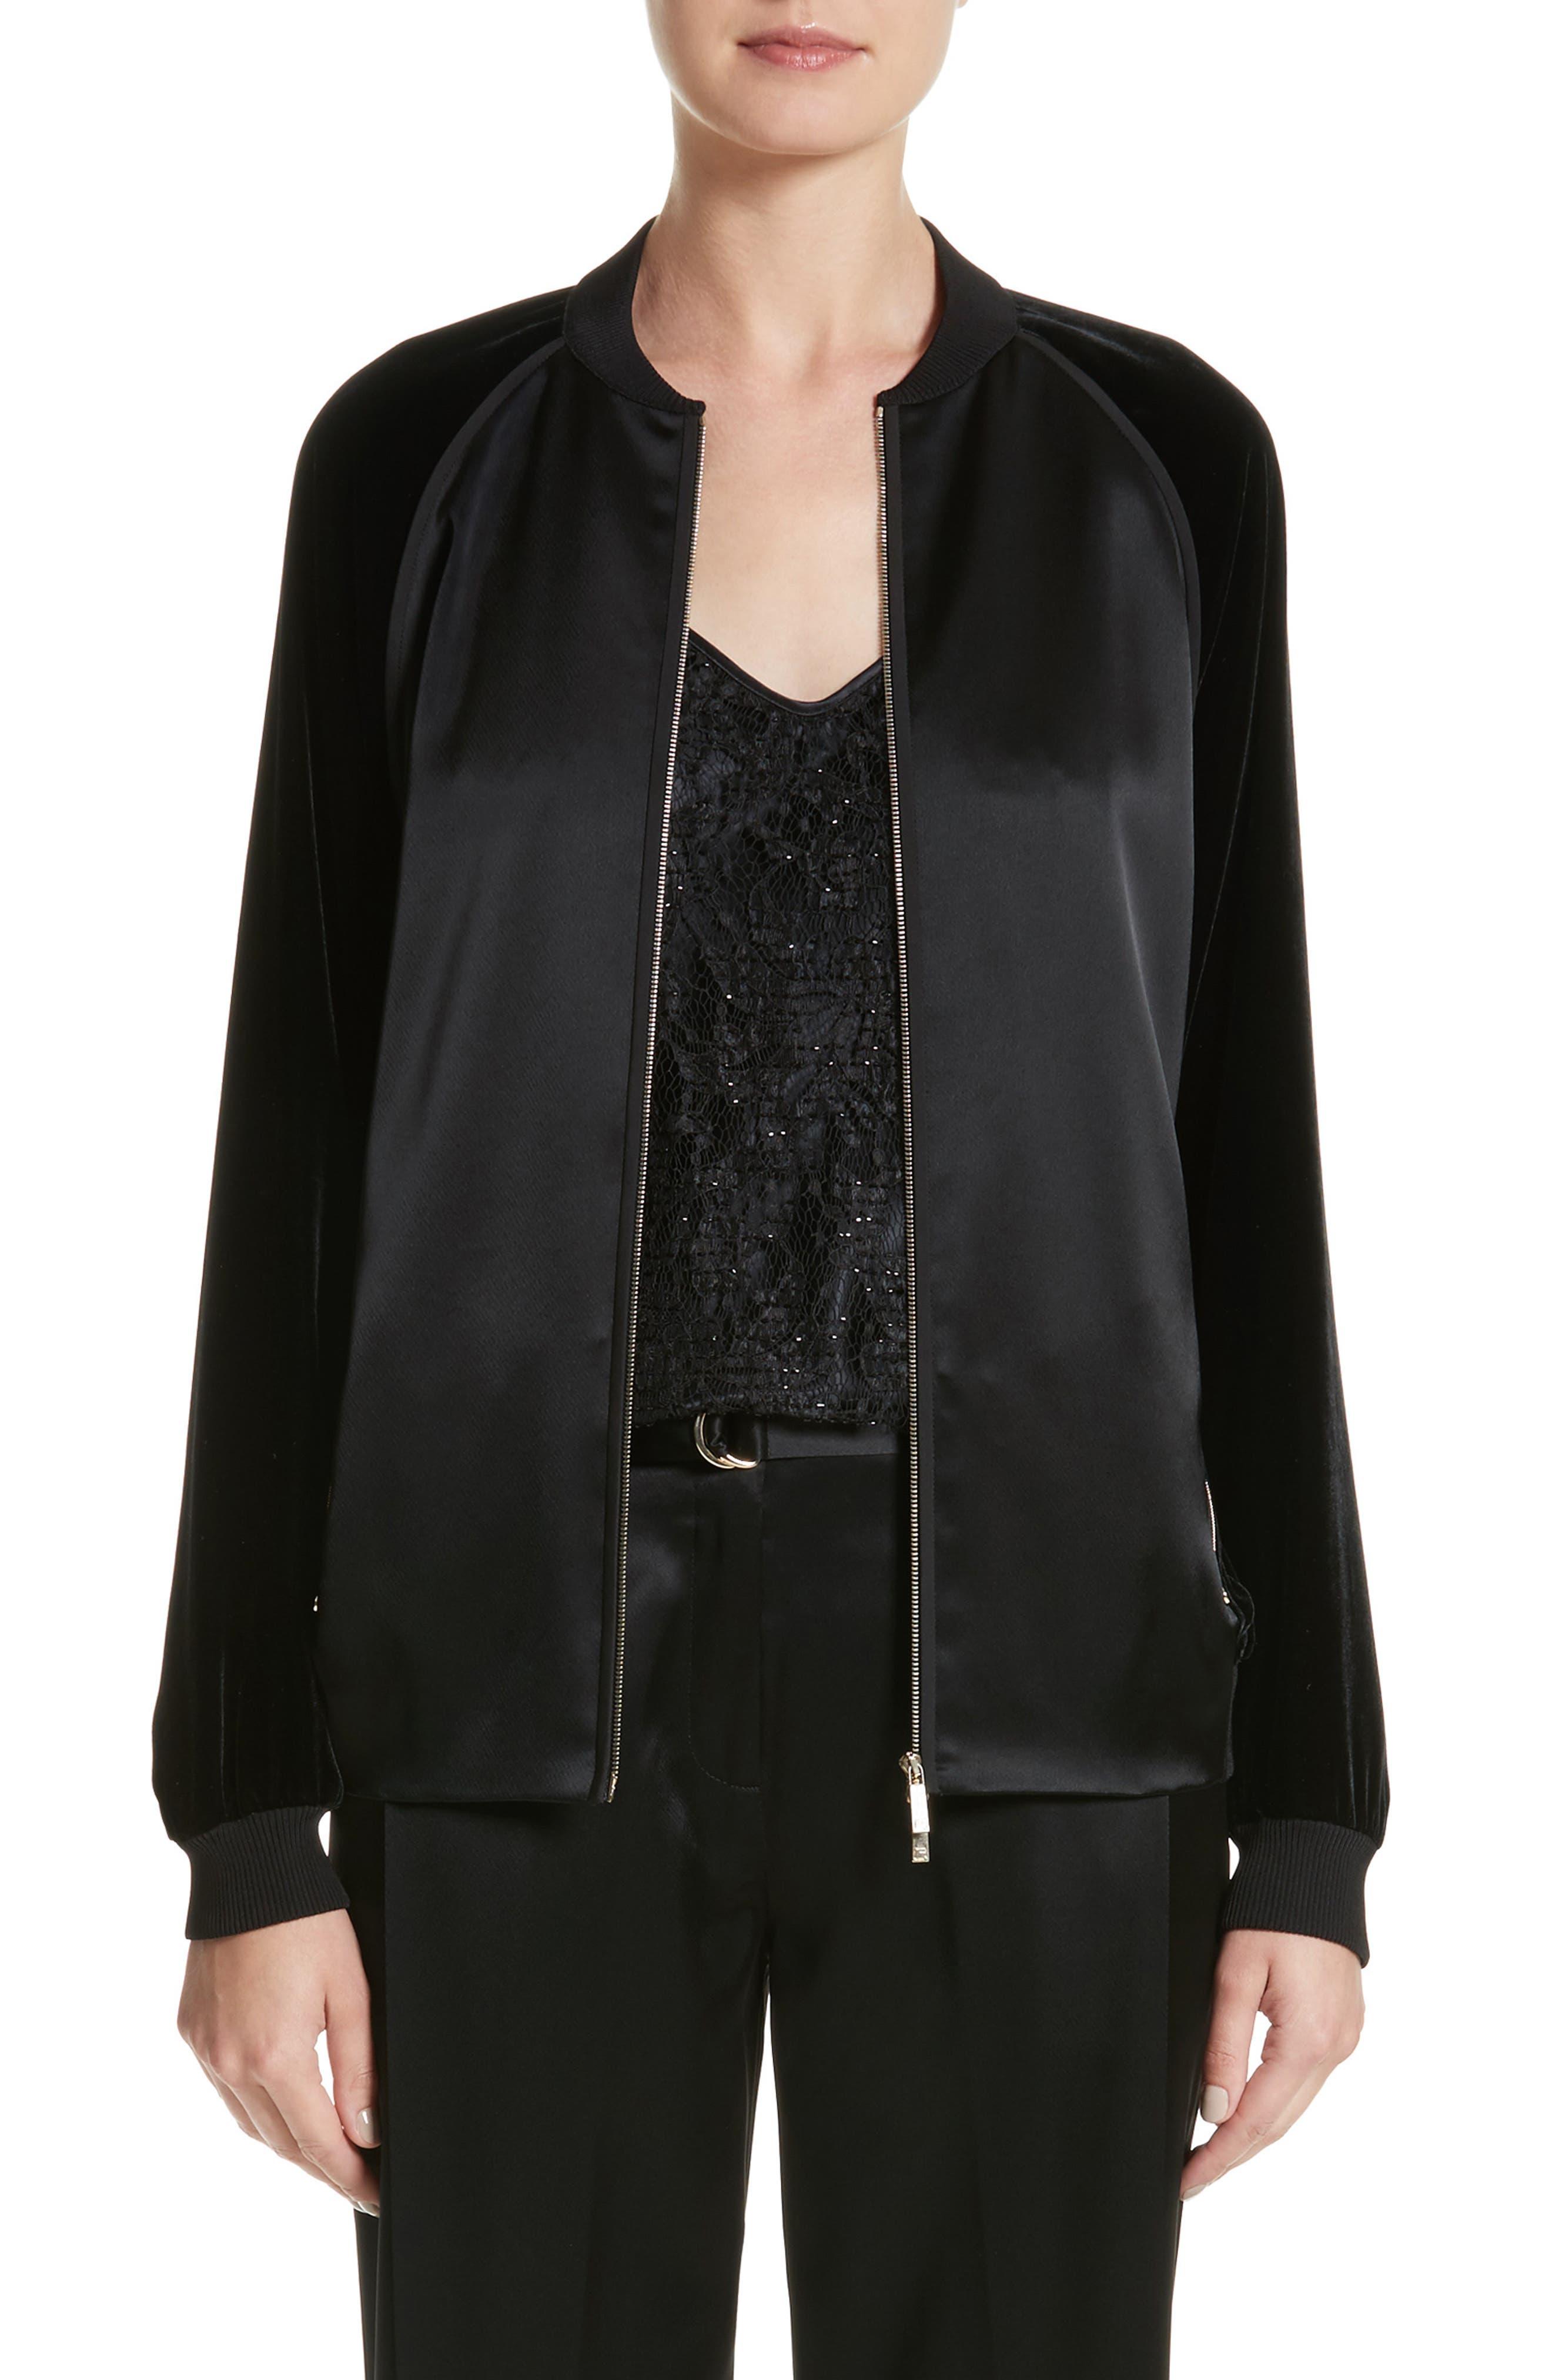 Brea Reverie Satin Cloth Bomber Jacket,                         Main,                         color, Black